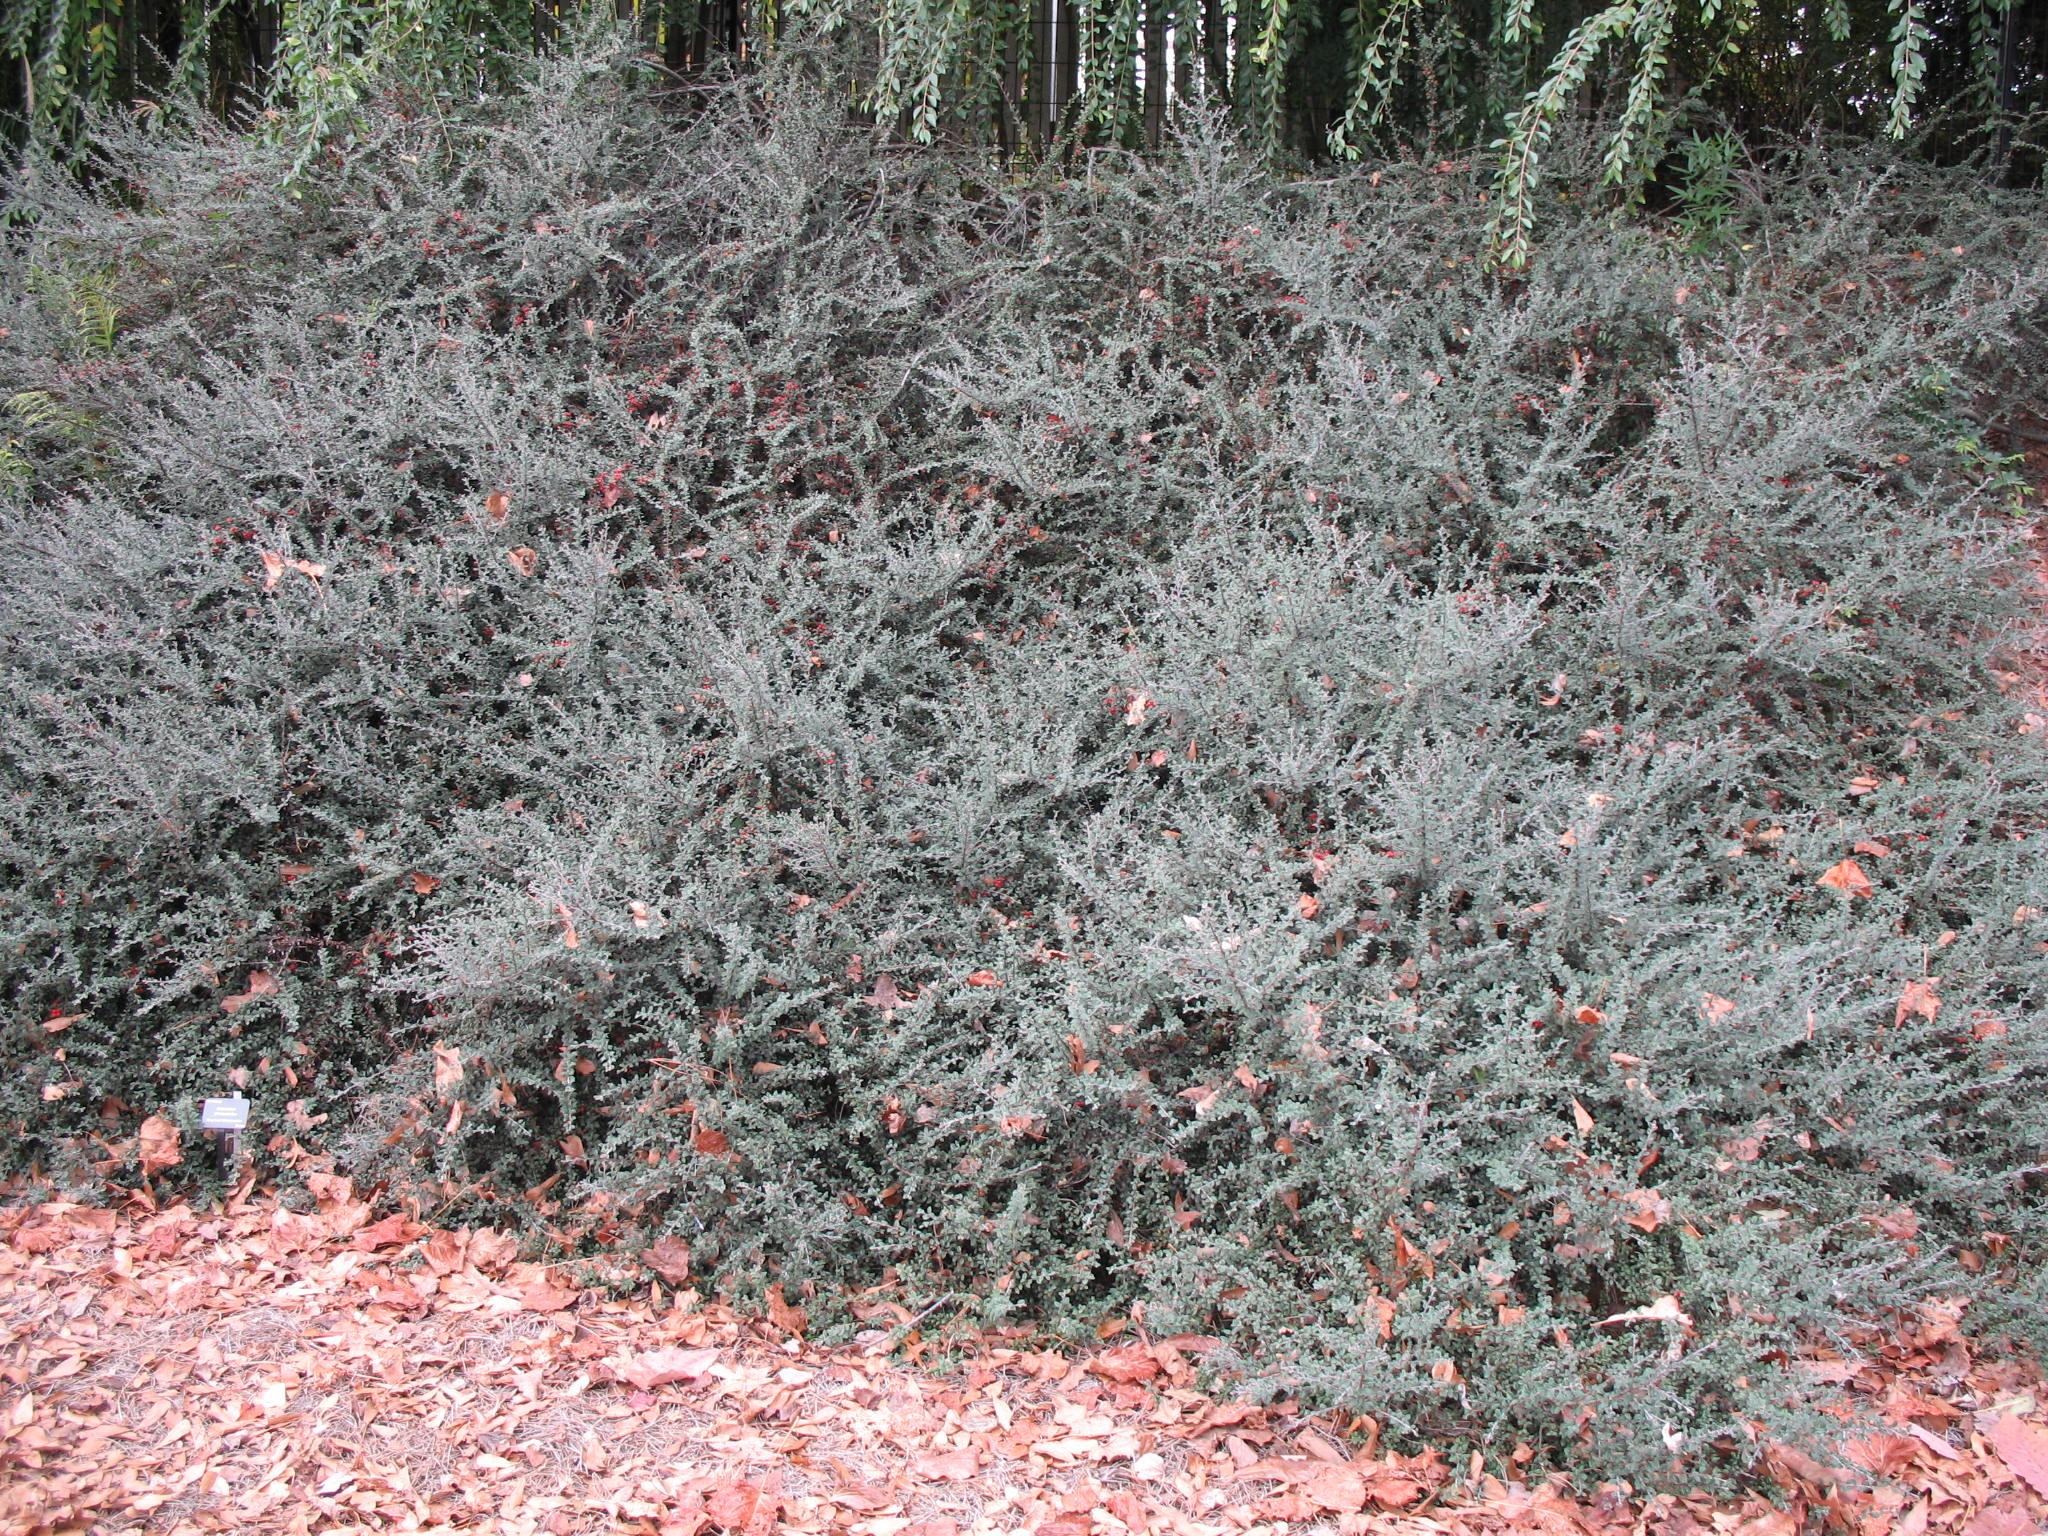 Cotoneaster glaucophyllus / Cotoneaster glaucophyllus